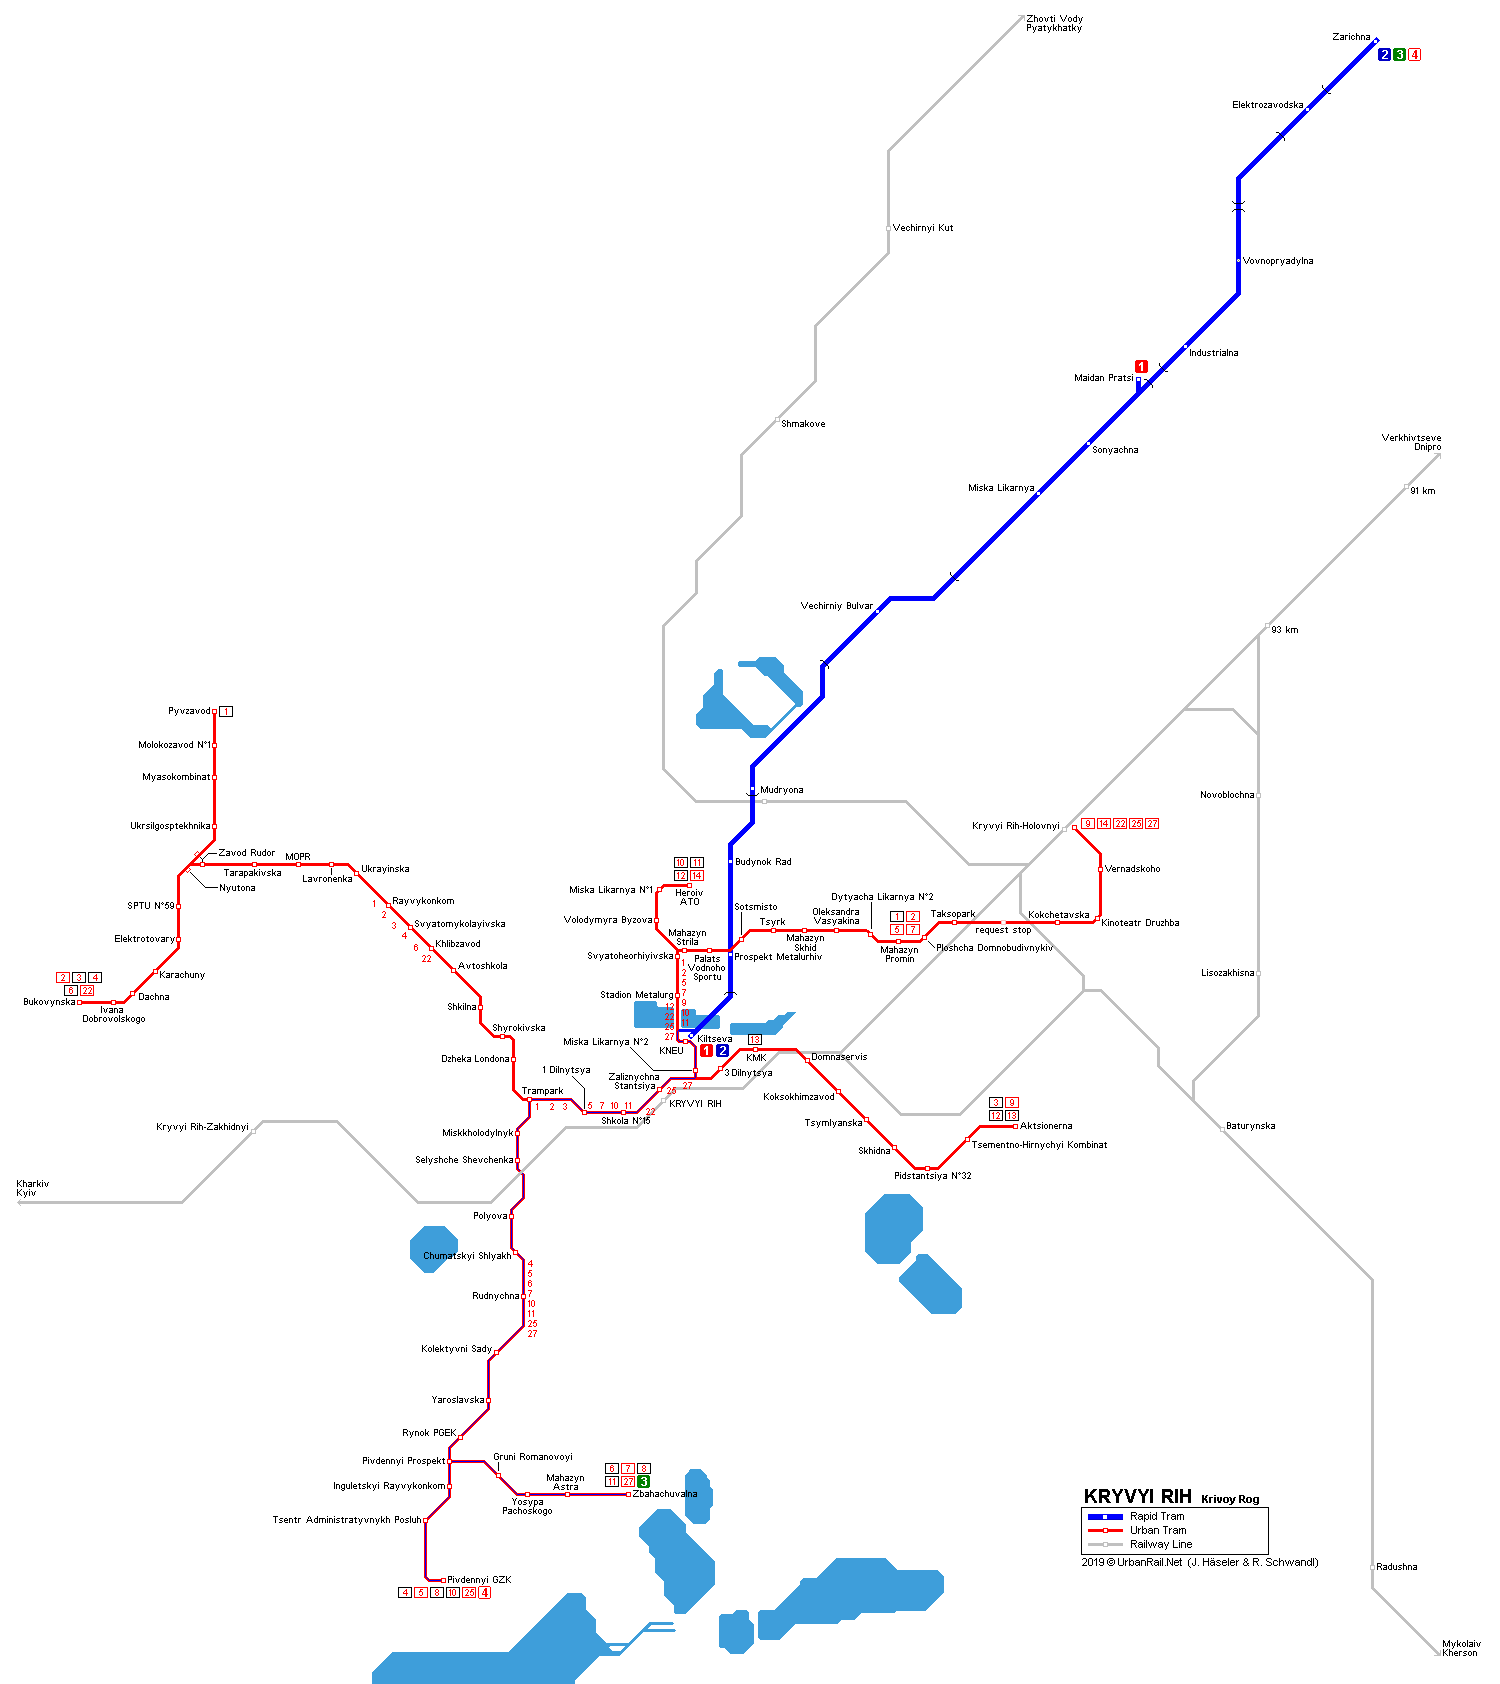 UrbanRailNet Europe Ukraine Kryvyi Rih Krivoy Rog metrotram